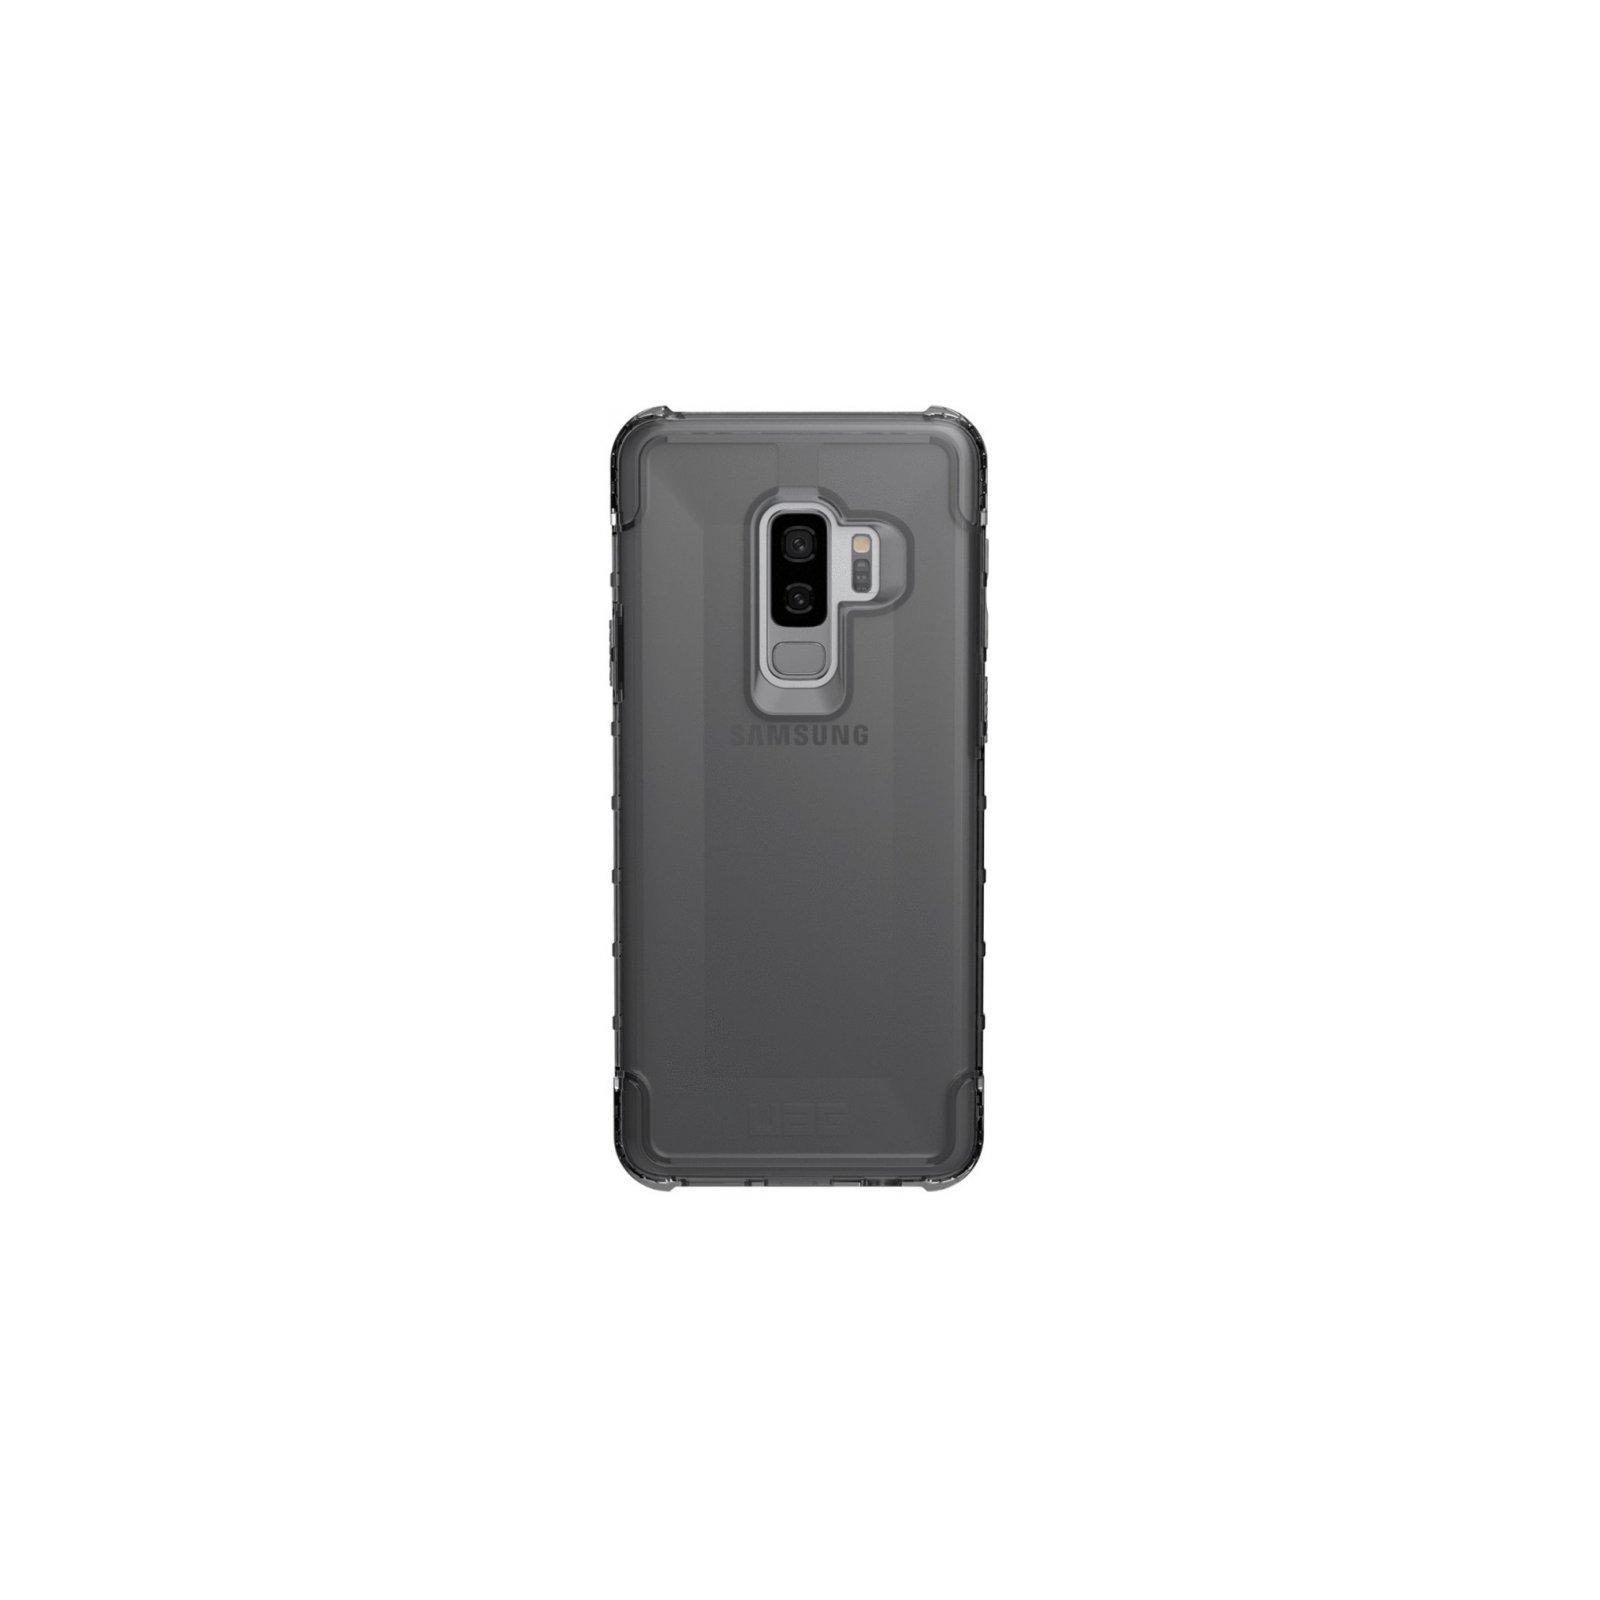 Чехол для моб. телефона Uag Galaxy S9+ Plyo Ash (GLXS9PLS-Y-AS)